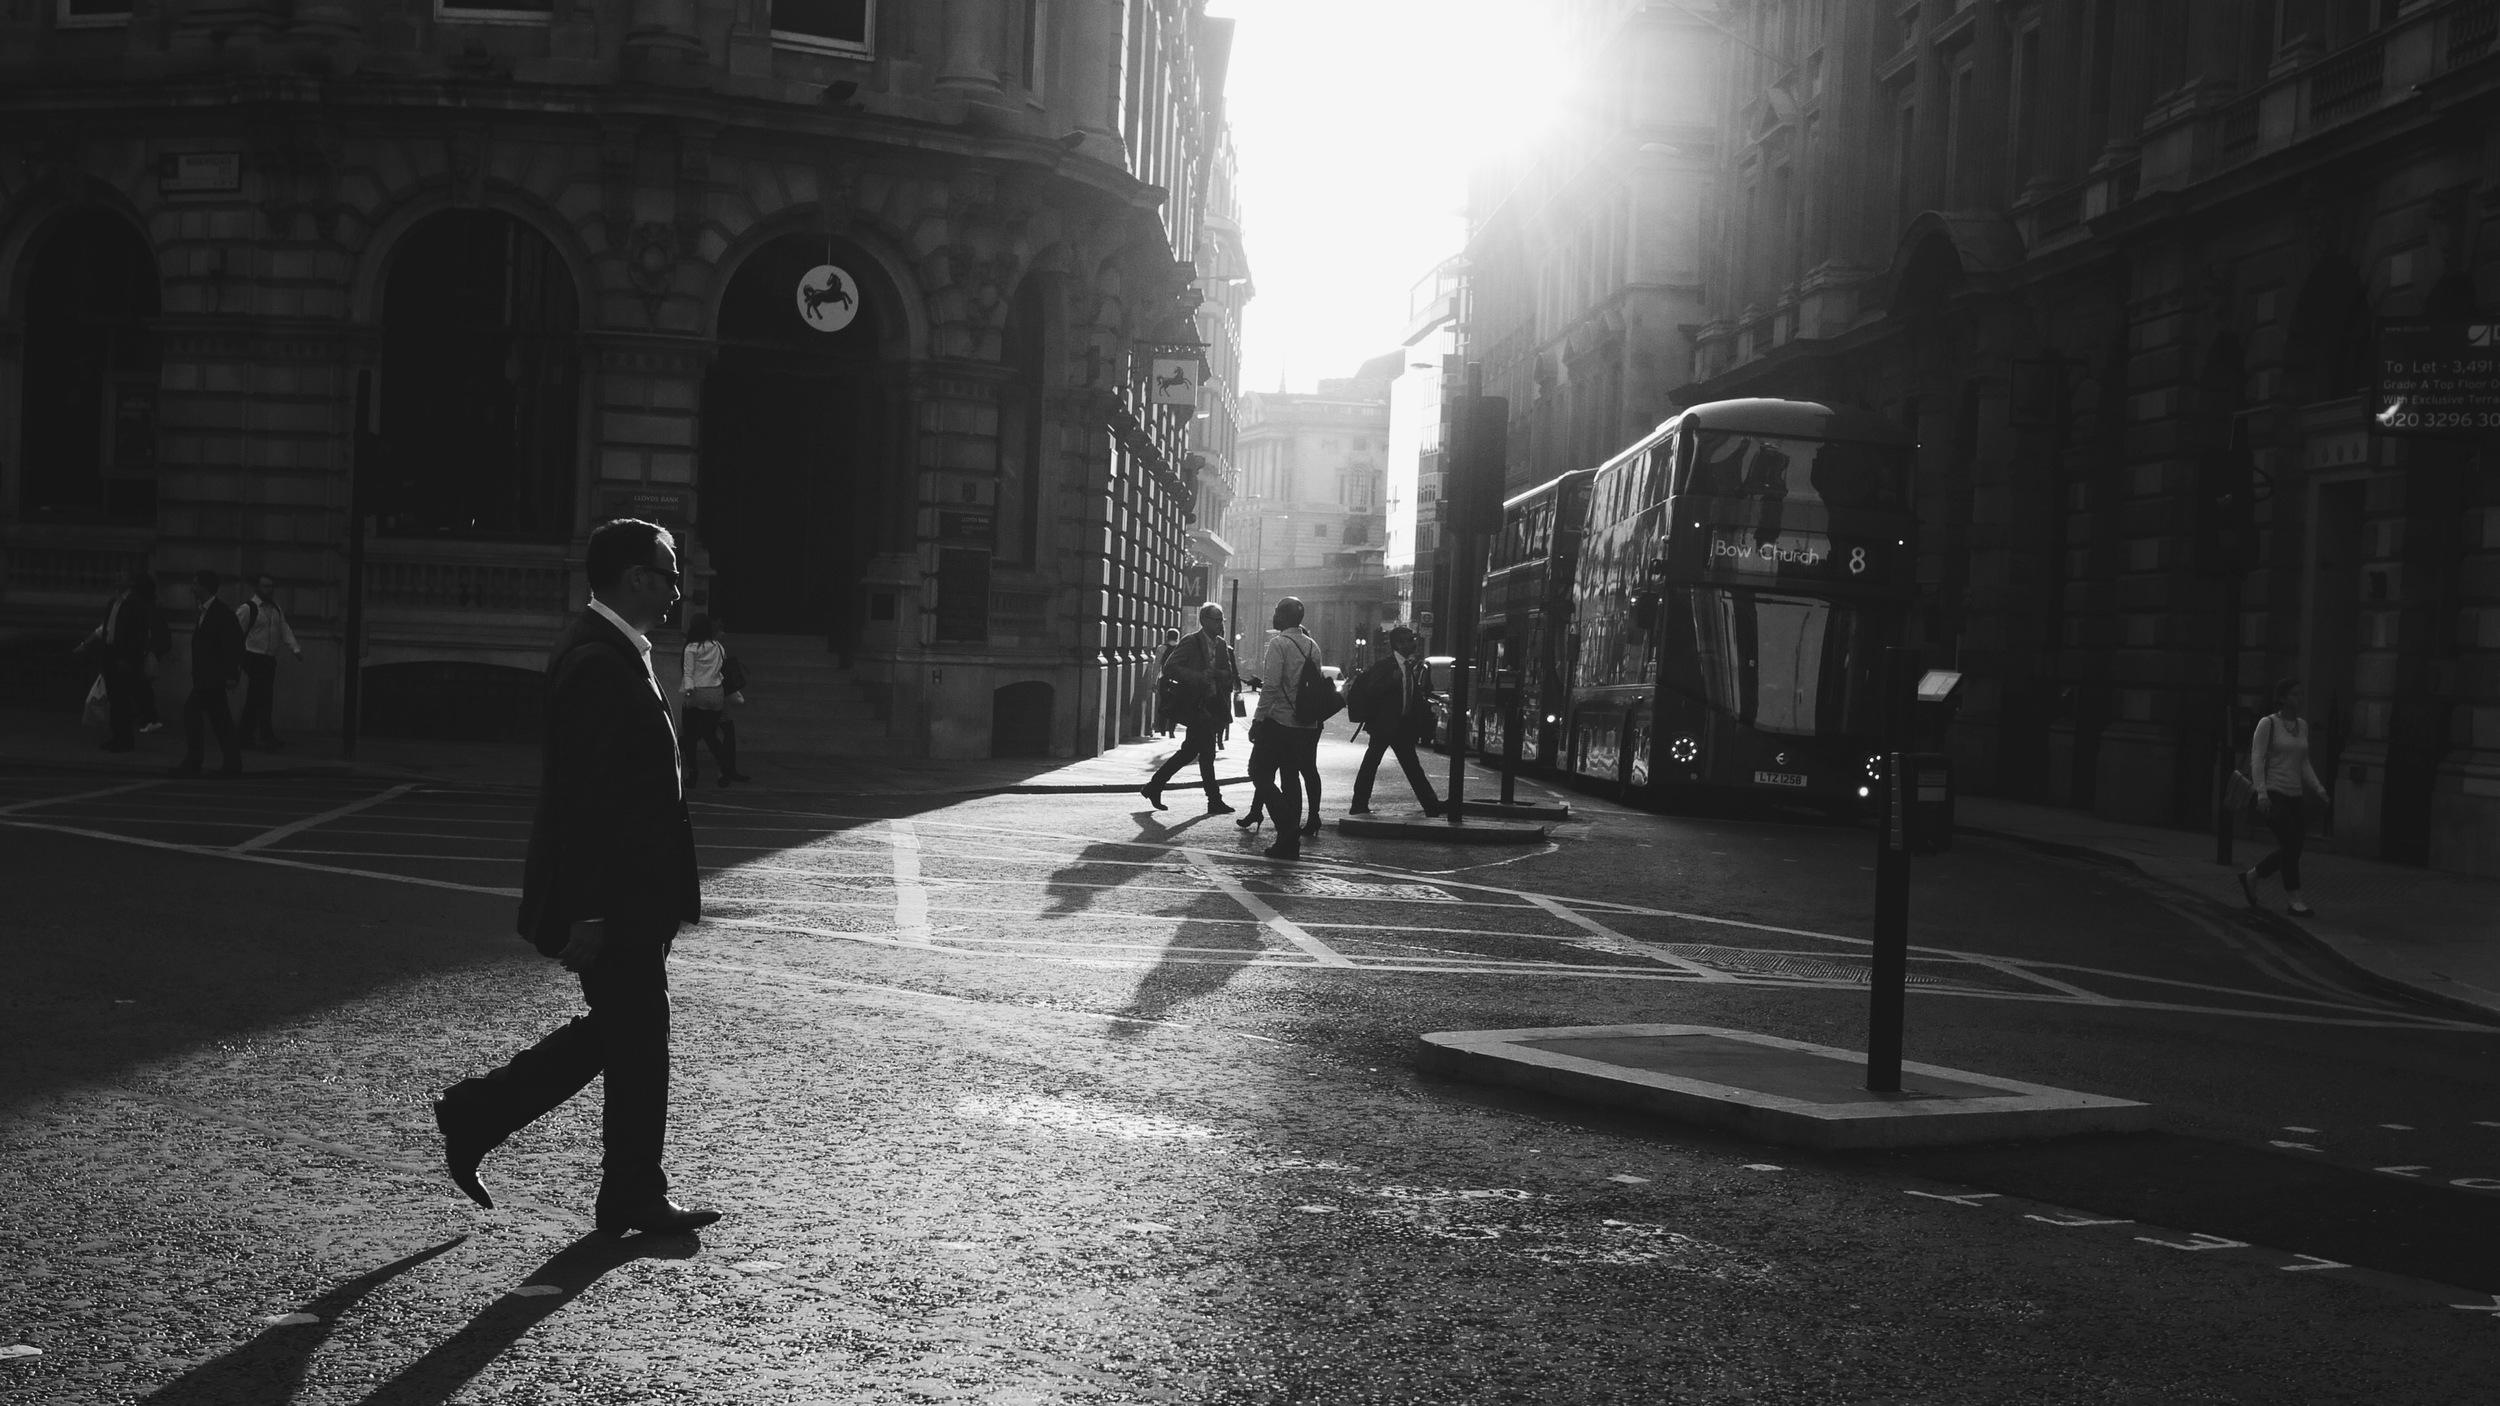 Liverpool St. crossing